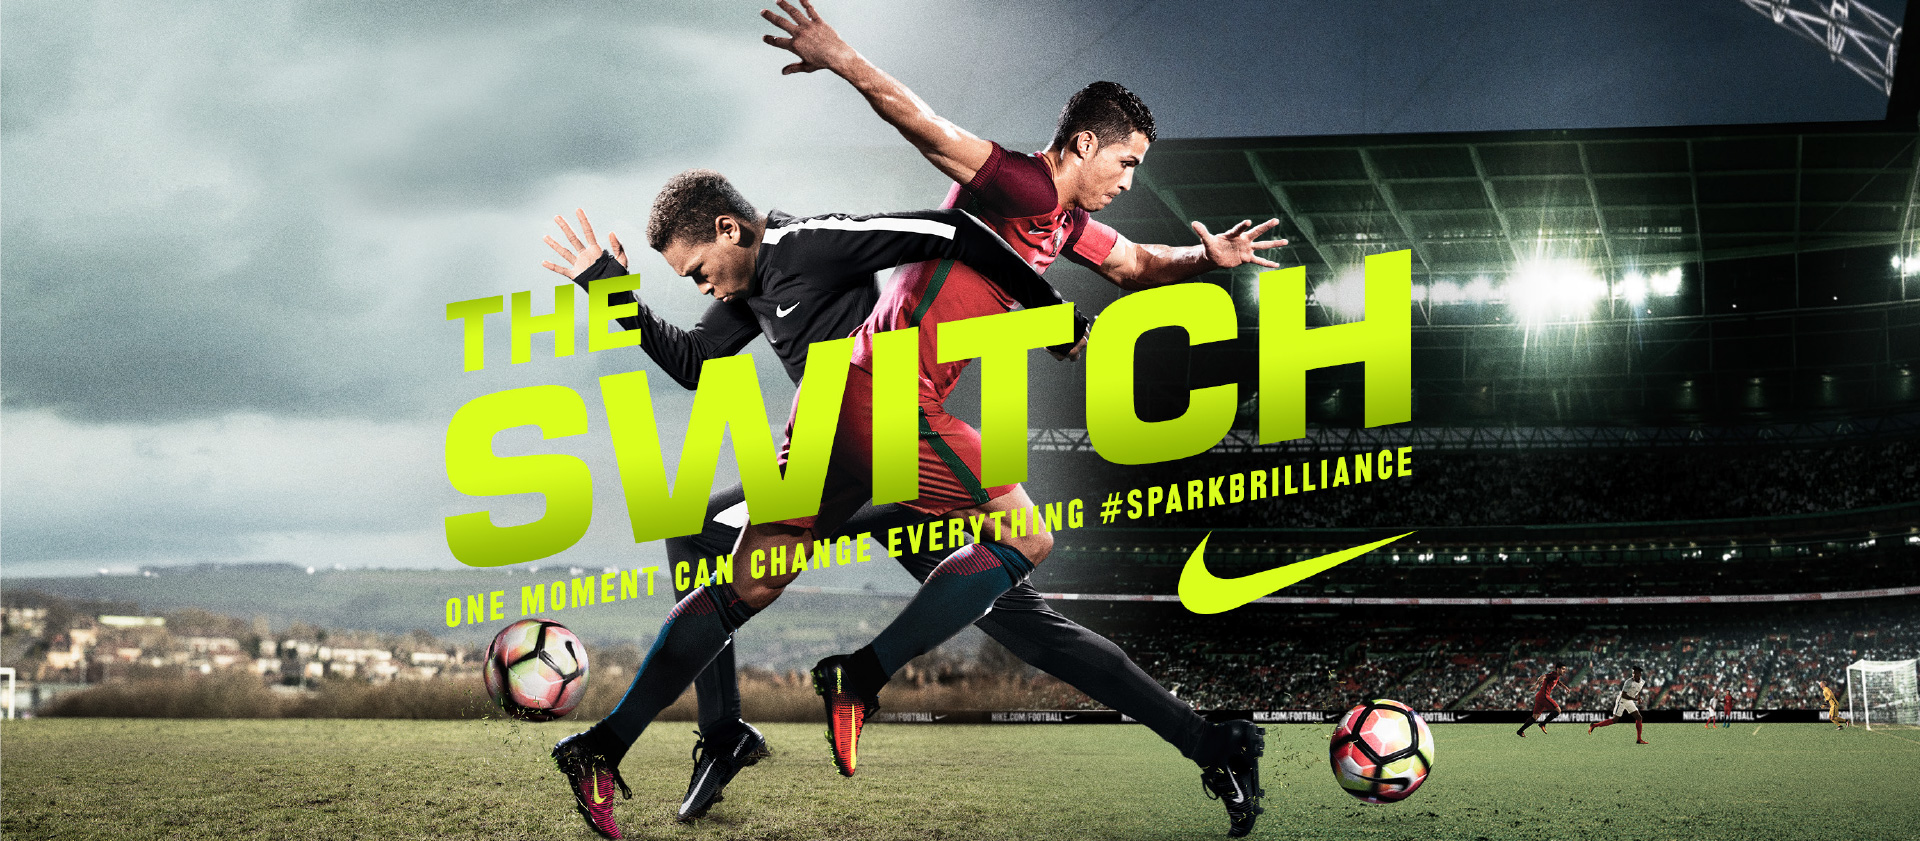 Cristiano_Ronaldo_The_Switch_Zilka_Blahutka_Nike